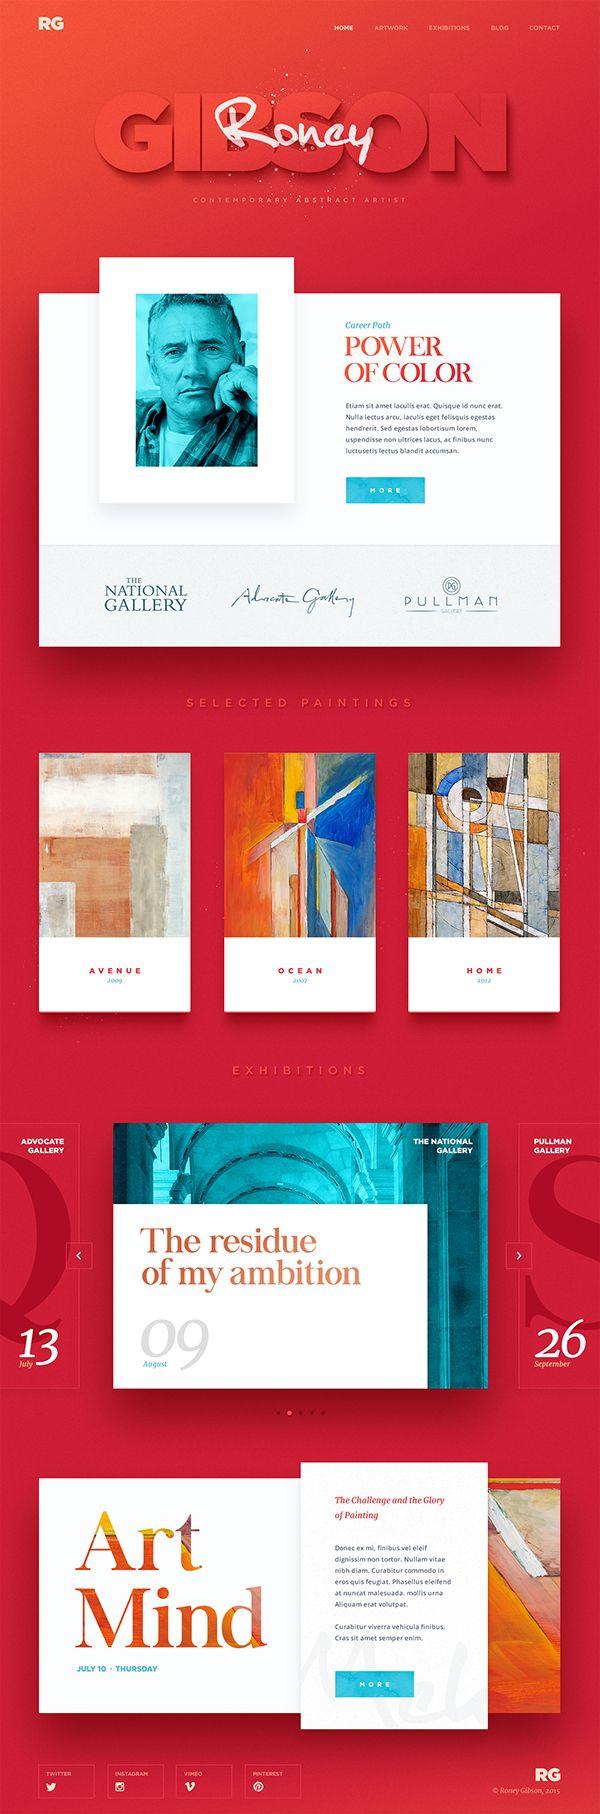 Roney Gibson: Website design